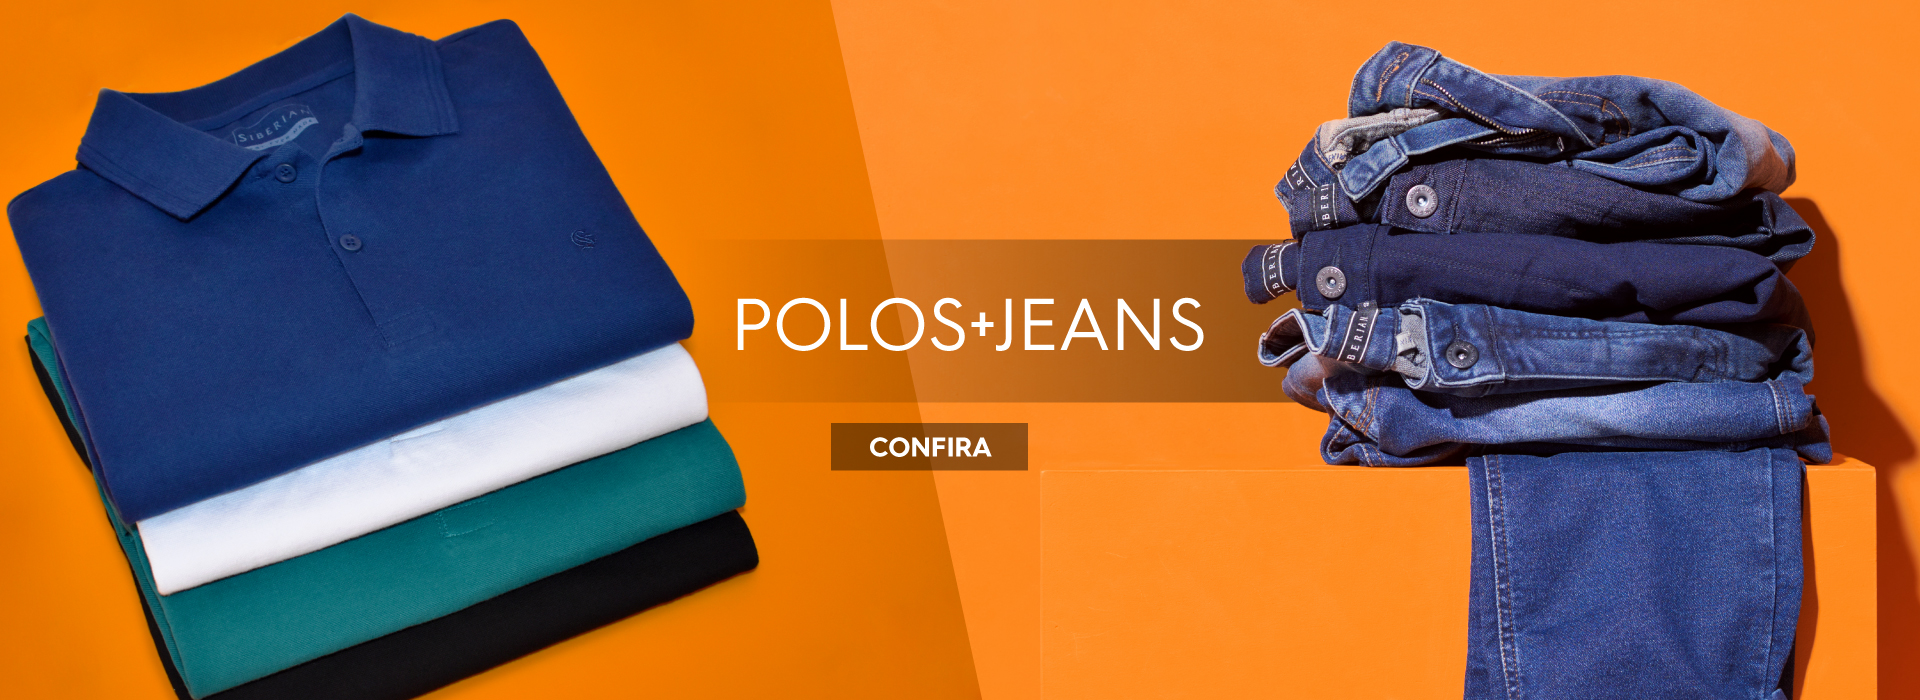 Polos e Jeans